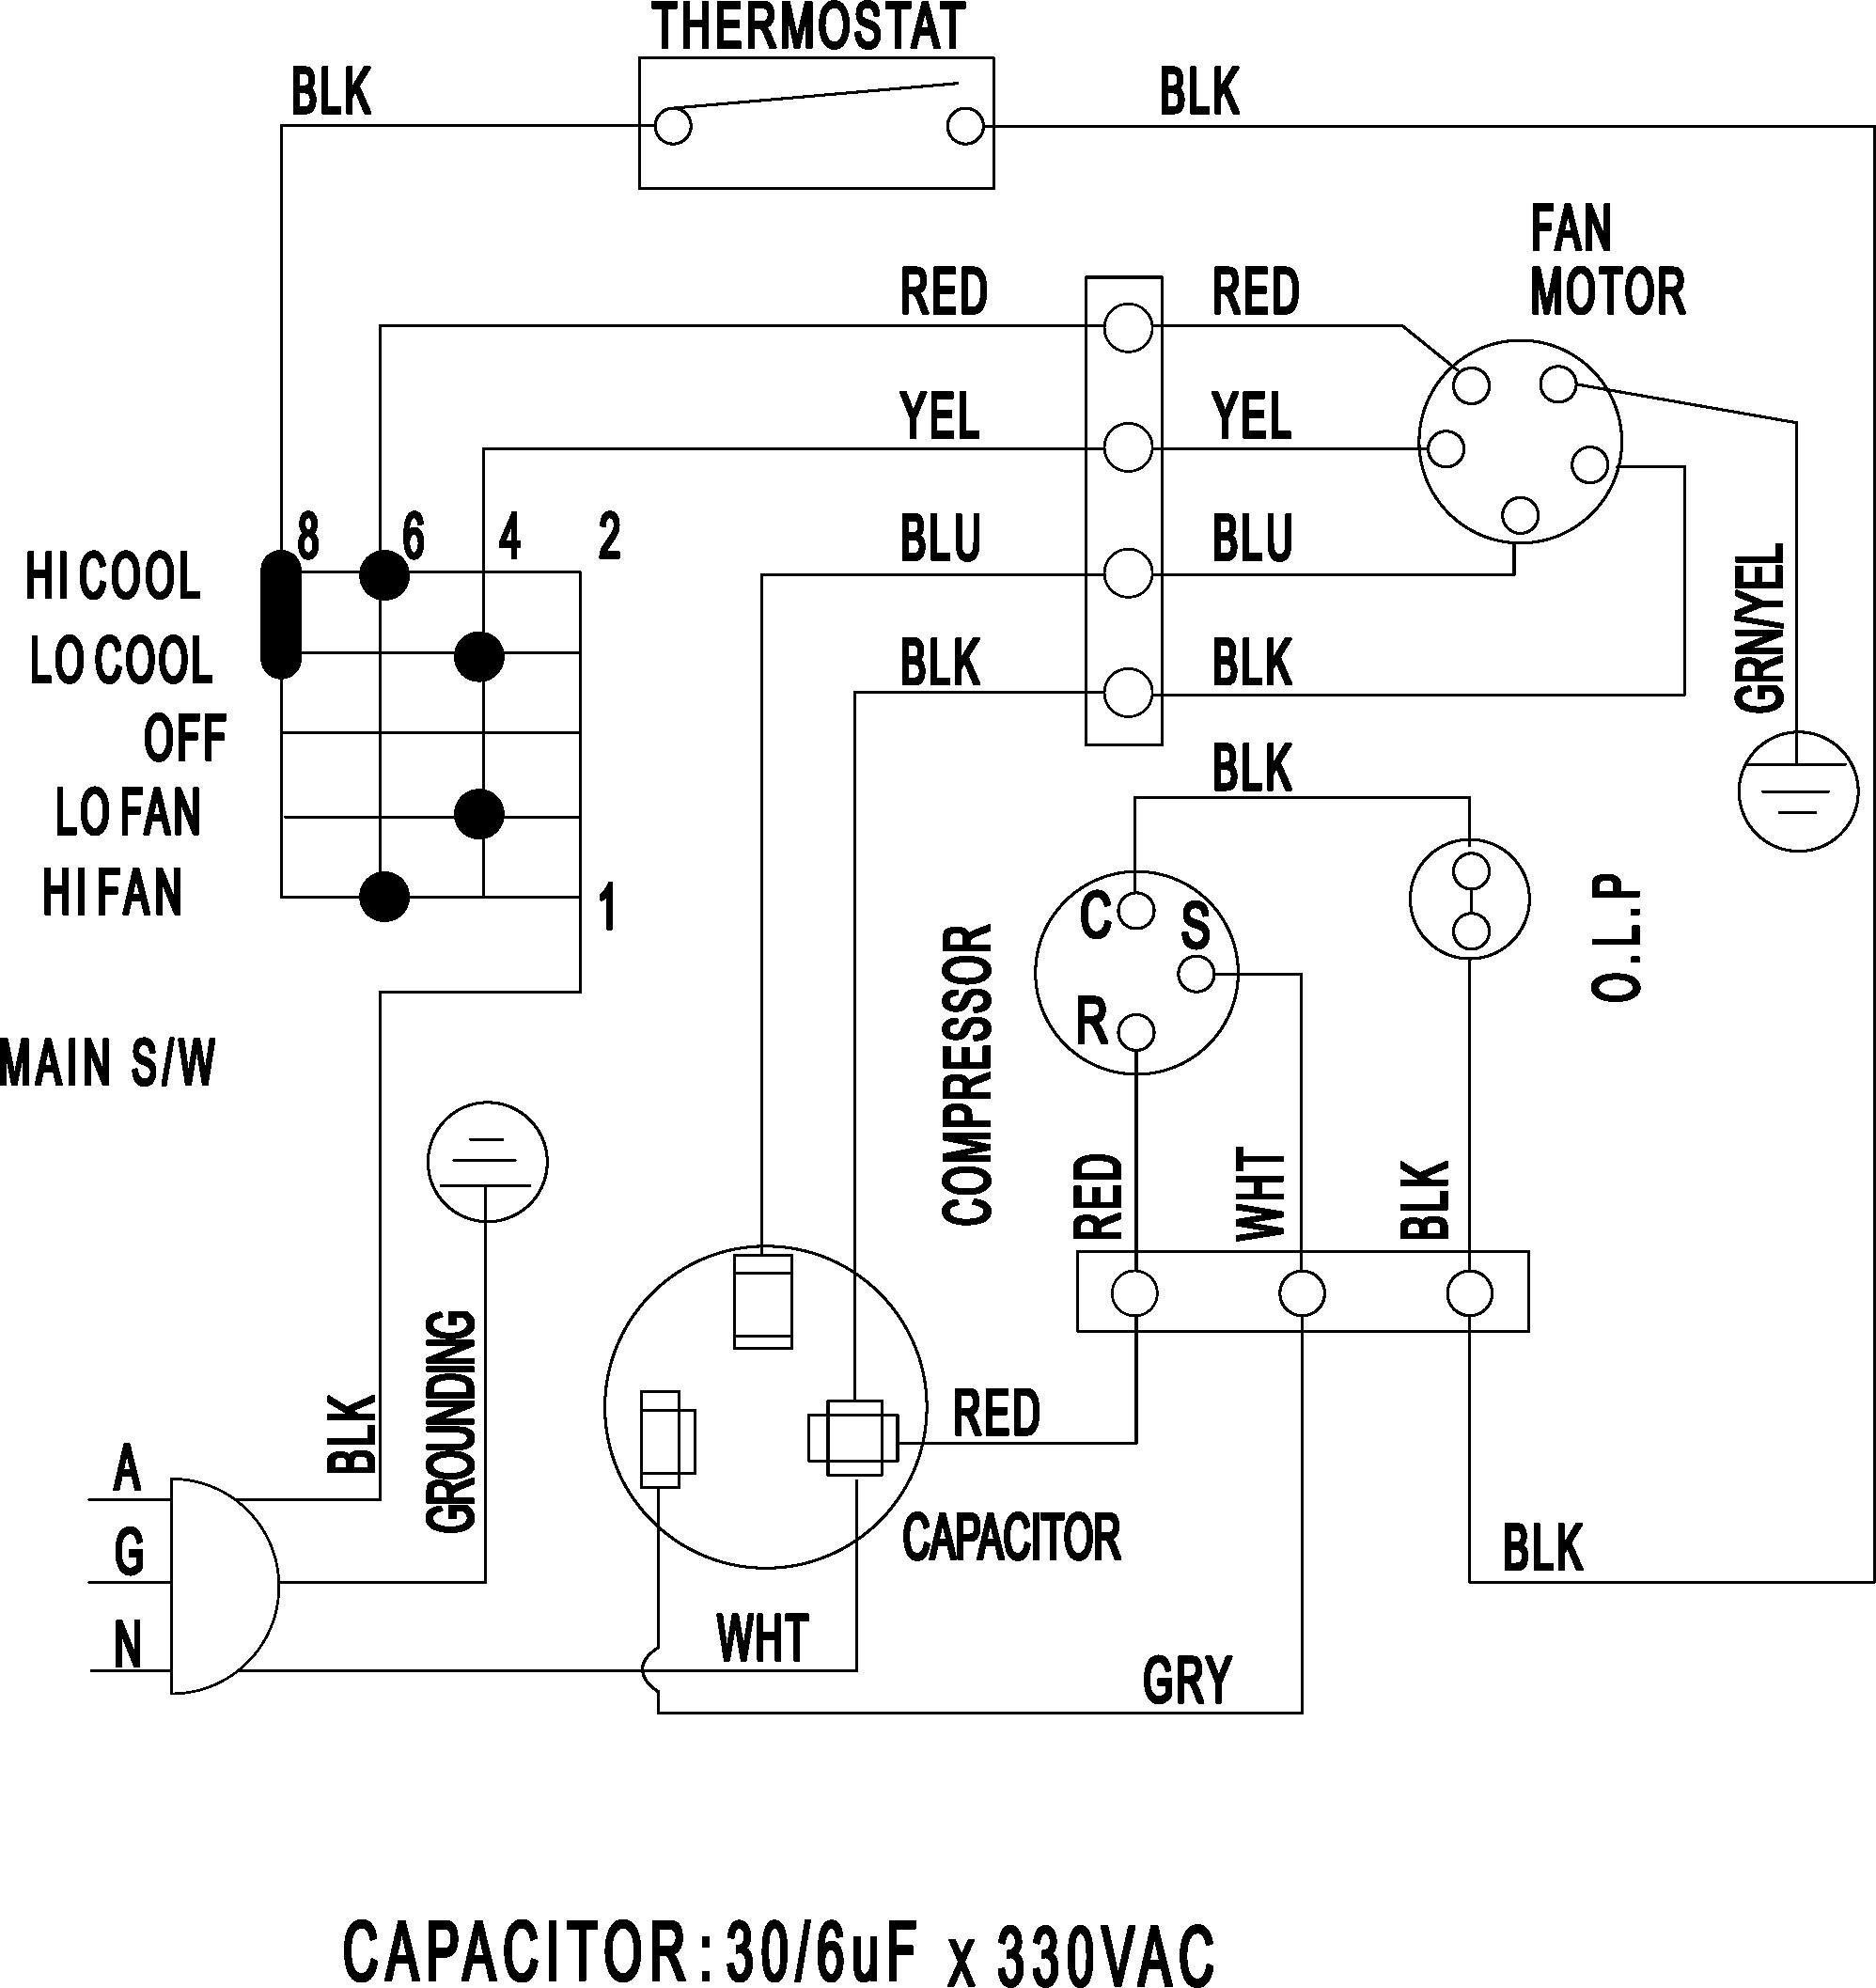 VO_8525] Conditioner Condenser Parts On Central Air Conditioner Wiring  Diagram Download Diagram | Hvac Wiring Diagrams 101 |  | Scata Lectu Isop Vira Mohammedshrine Librar Wiring 101